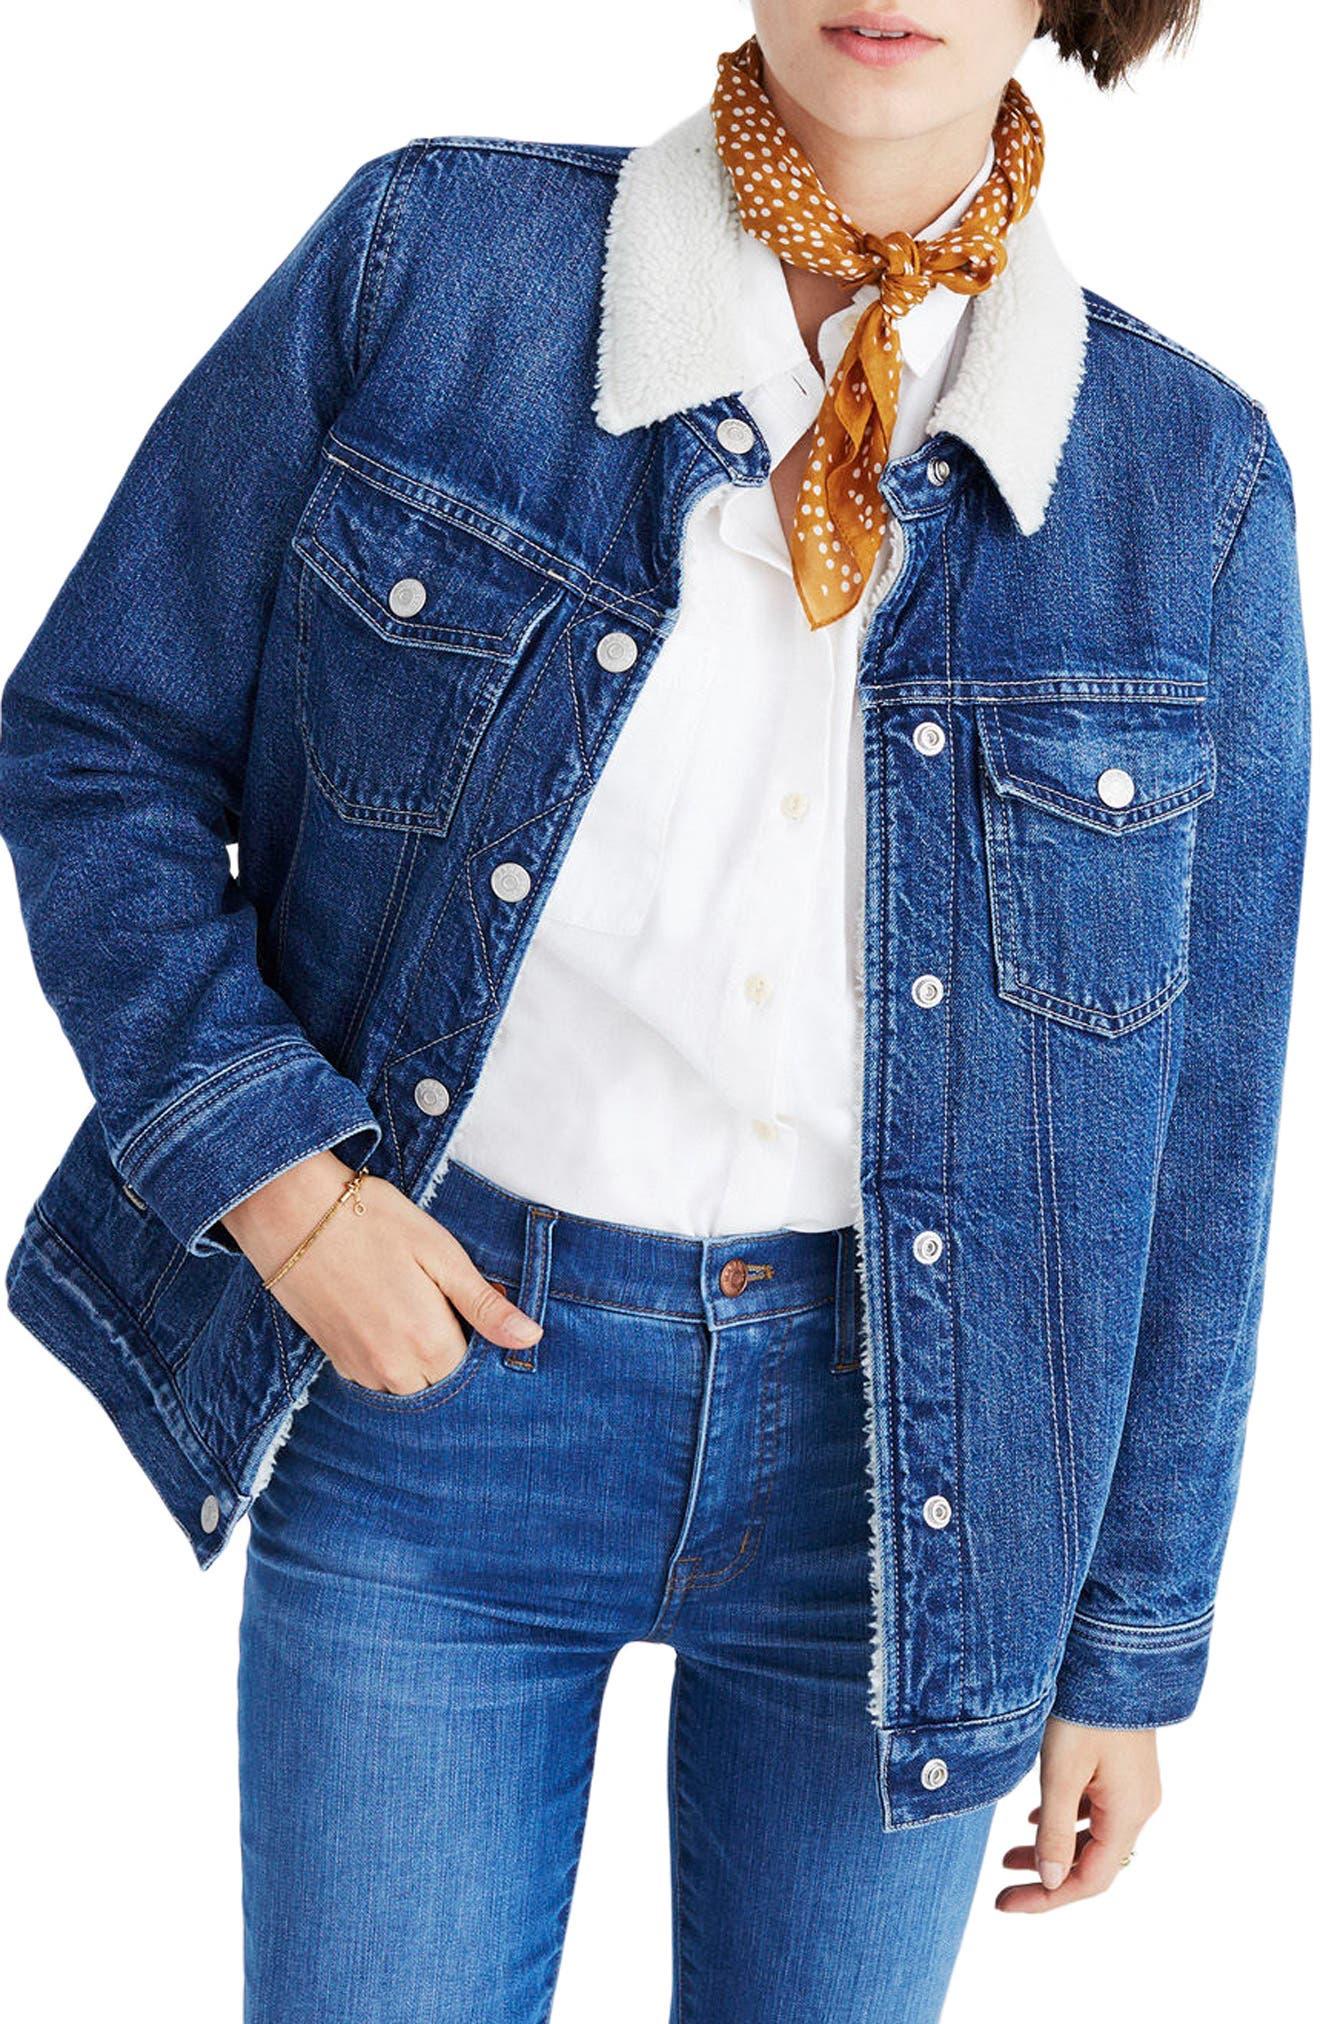 Jean Jackets: Women's Denim Jackets & Vests | Nordstrom